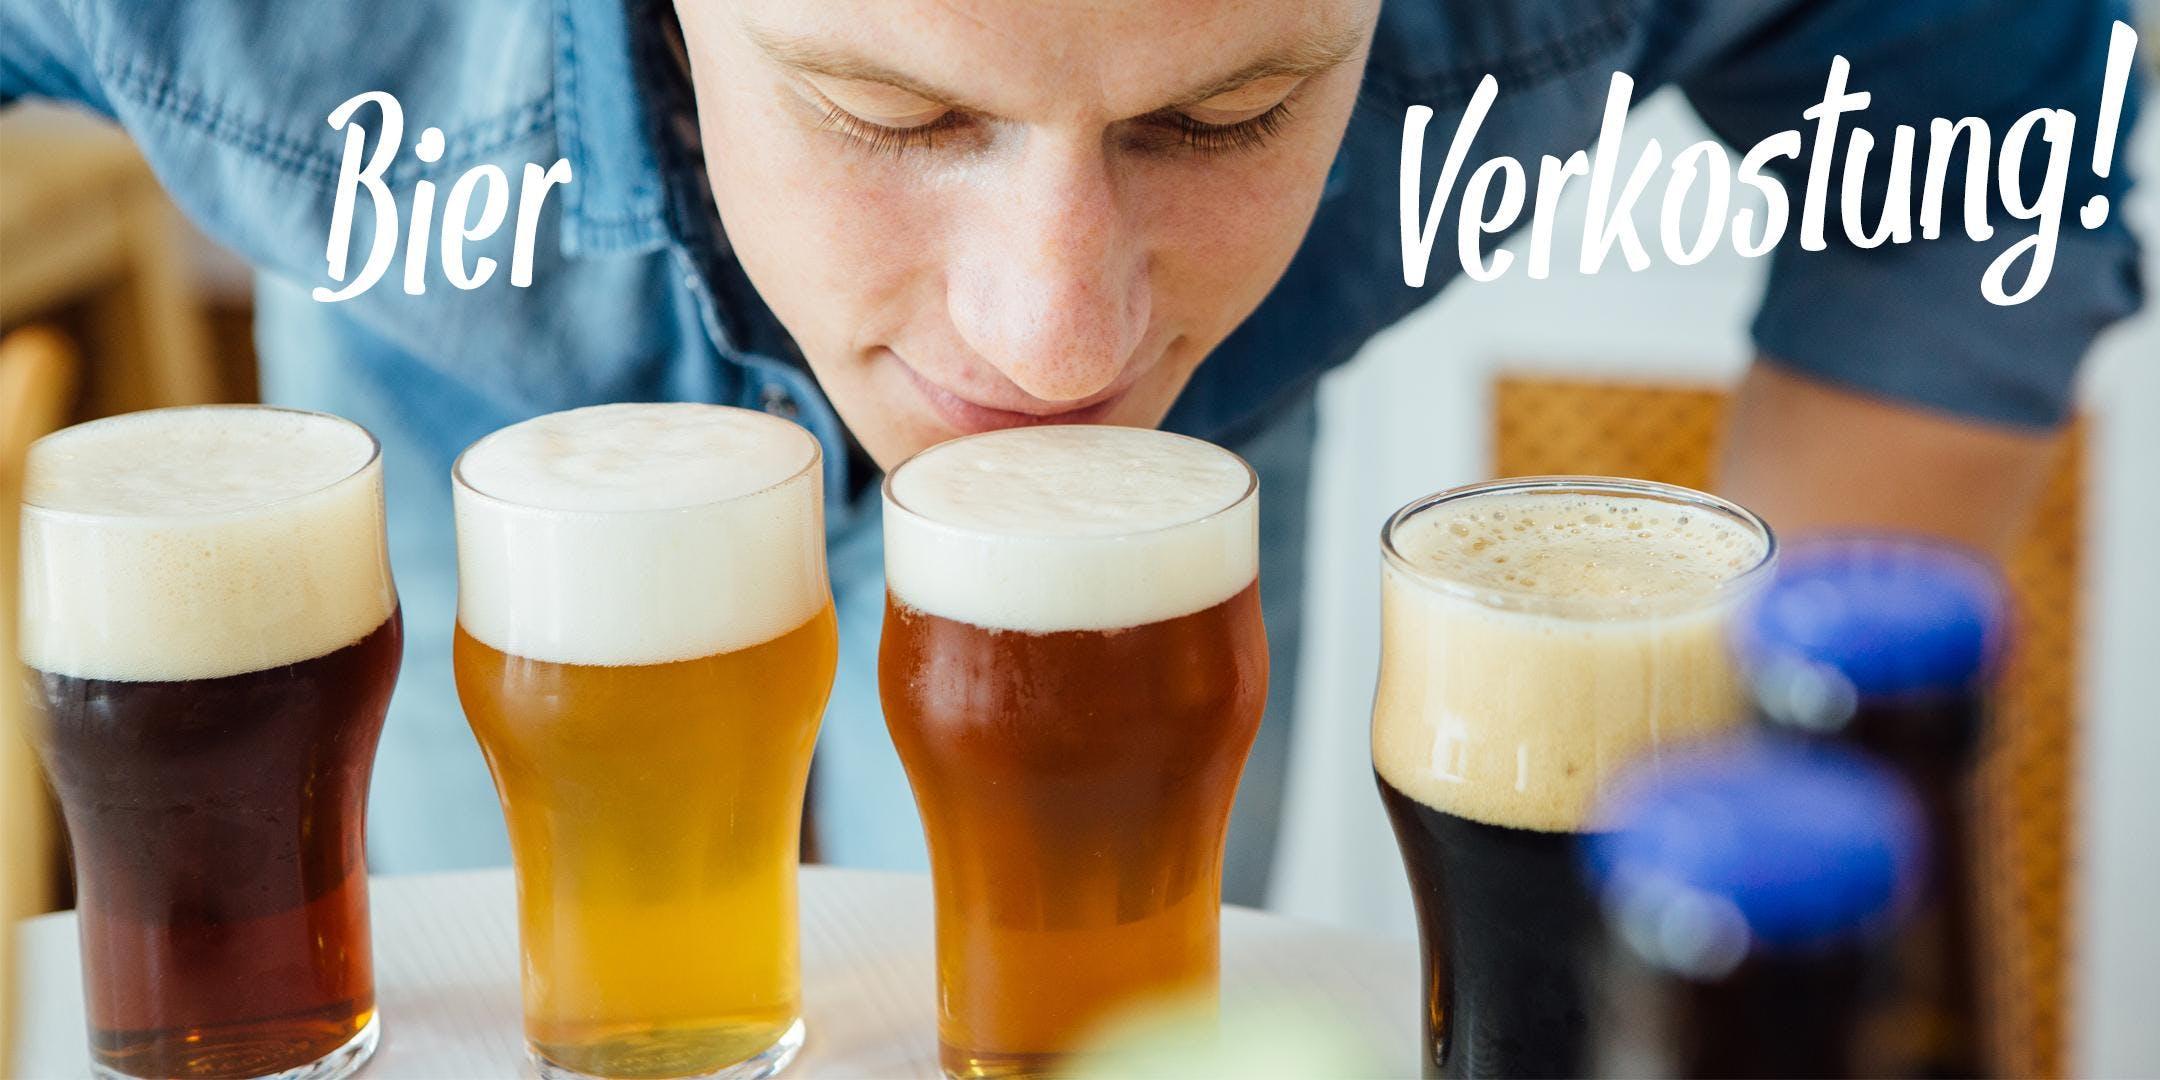 Bier Verkostung in ... - Potsdam - 02/08/18 - Evensi